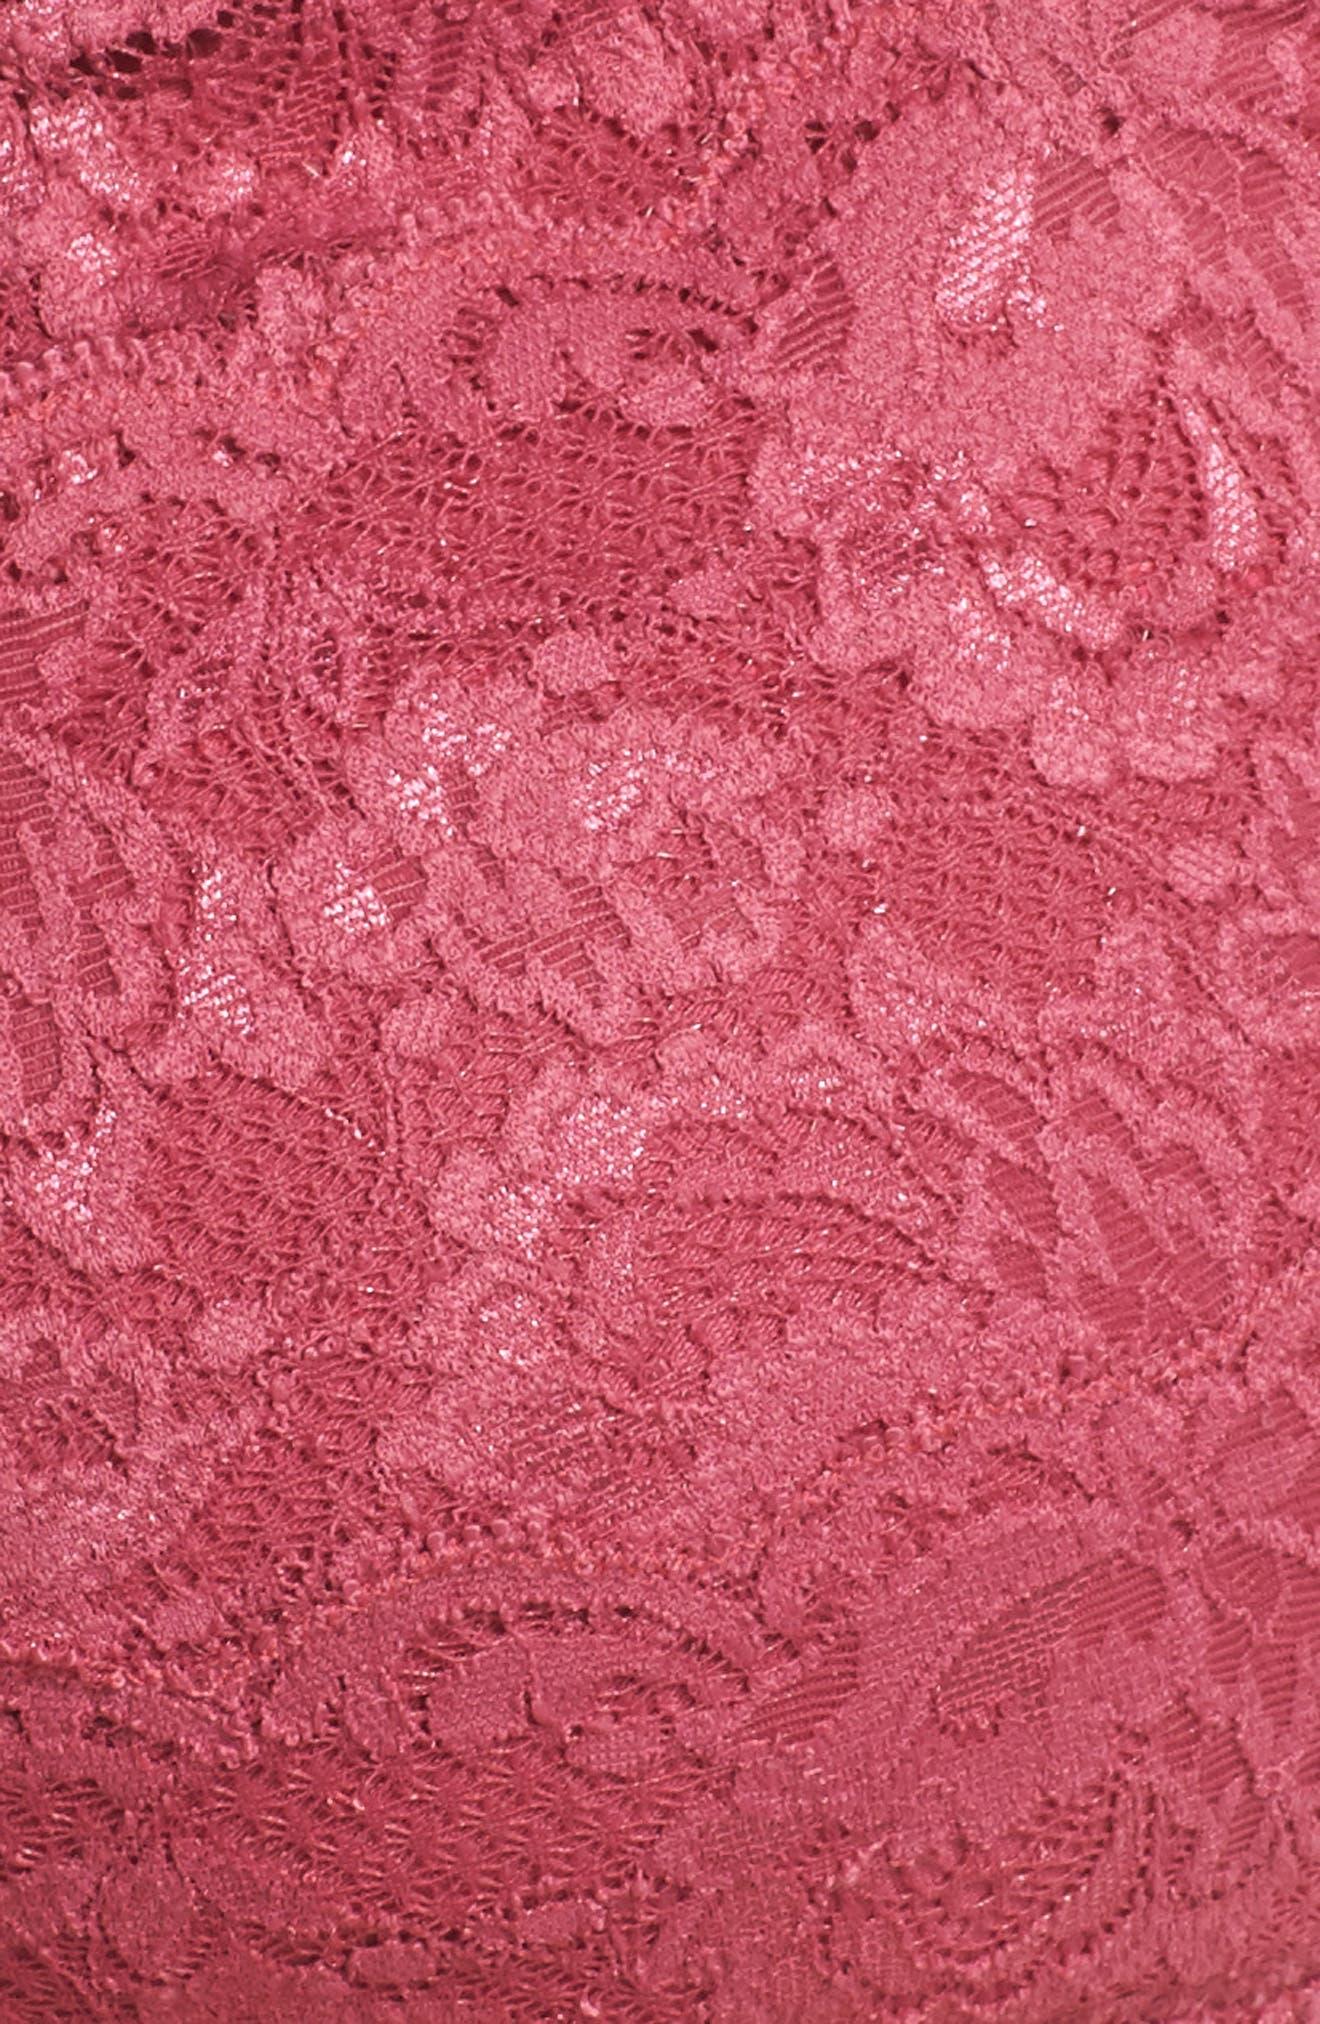 Never Say Never Plungie Lace Longline Bralette,                             Alternate thumbnail 27, color,